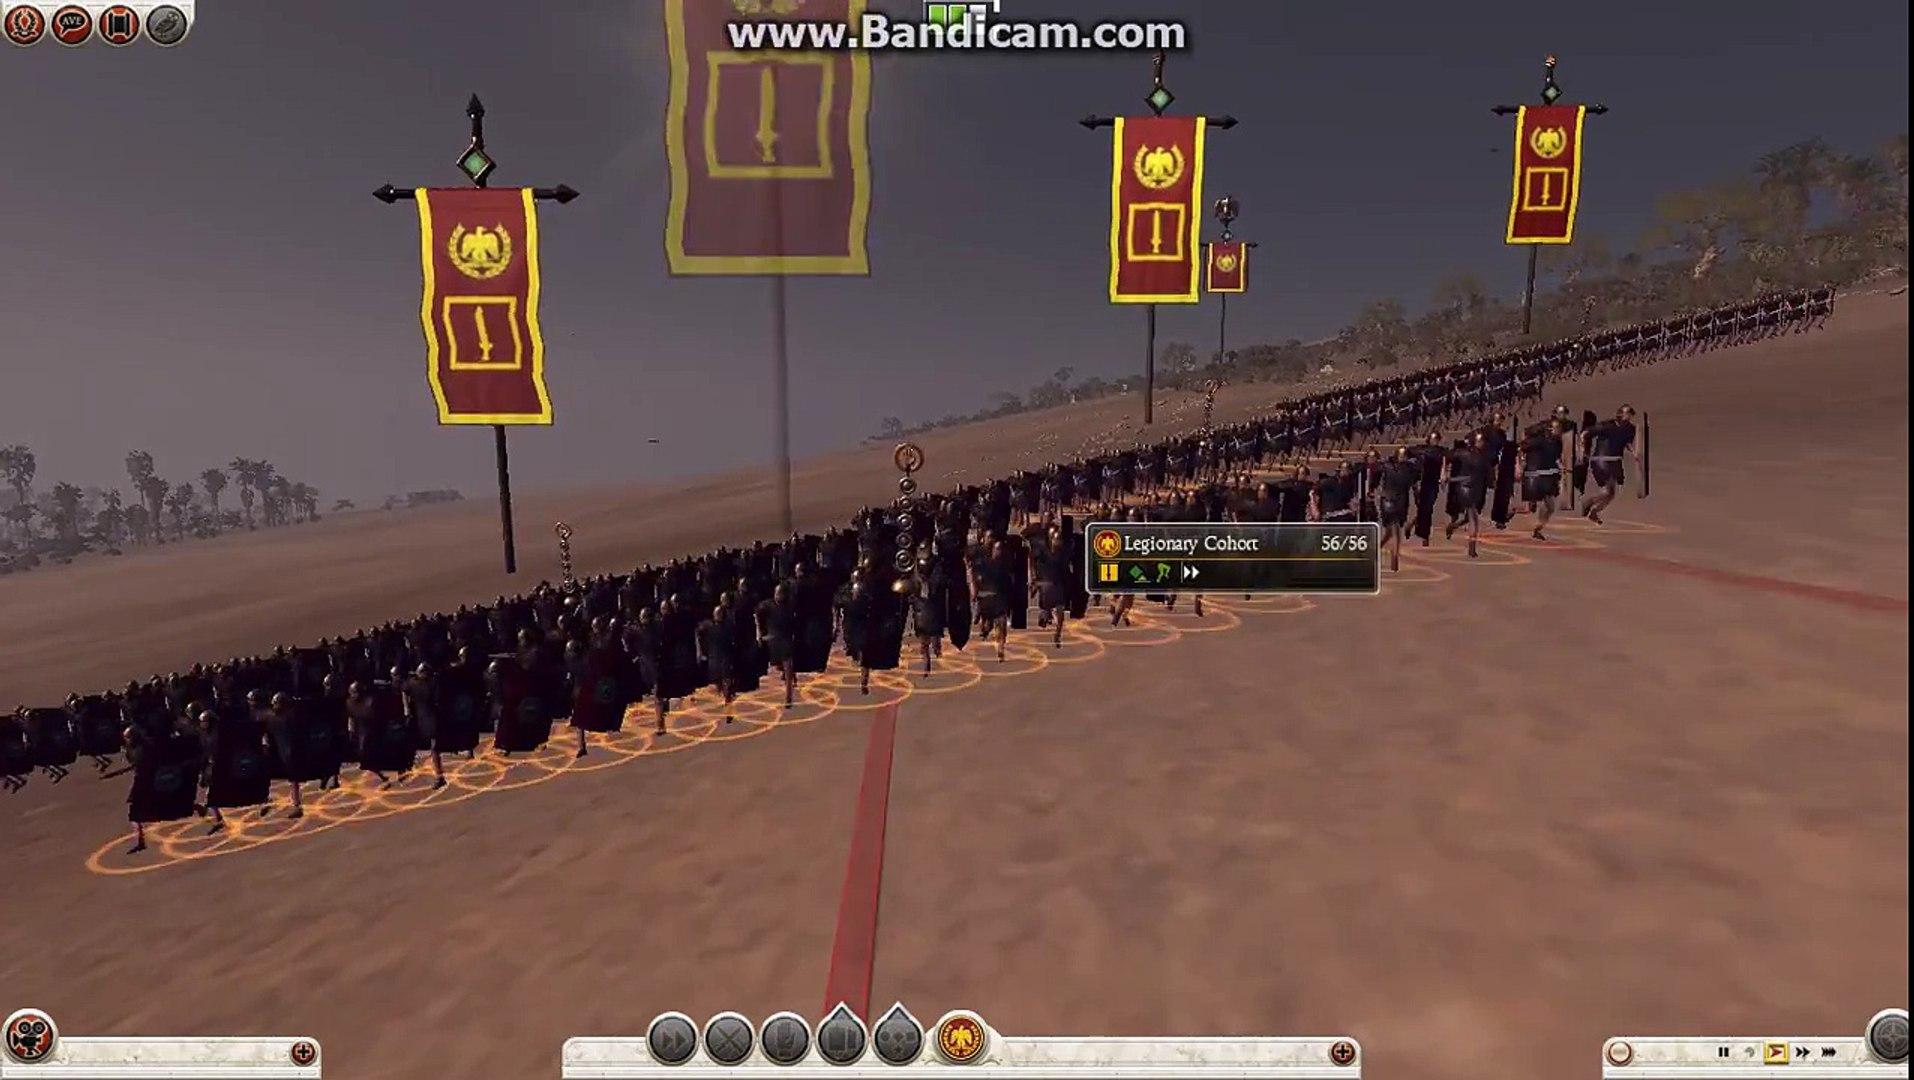 Rome 2 Total War - Rome 800 Soldiers Vs. Indian War Elephants